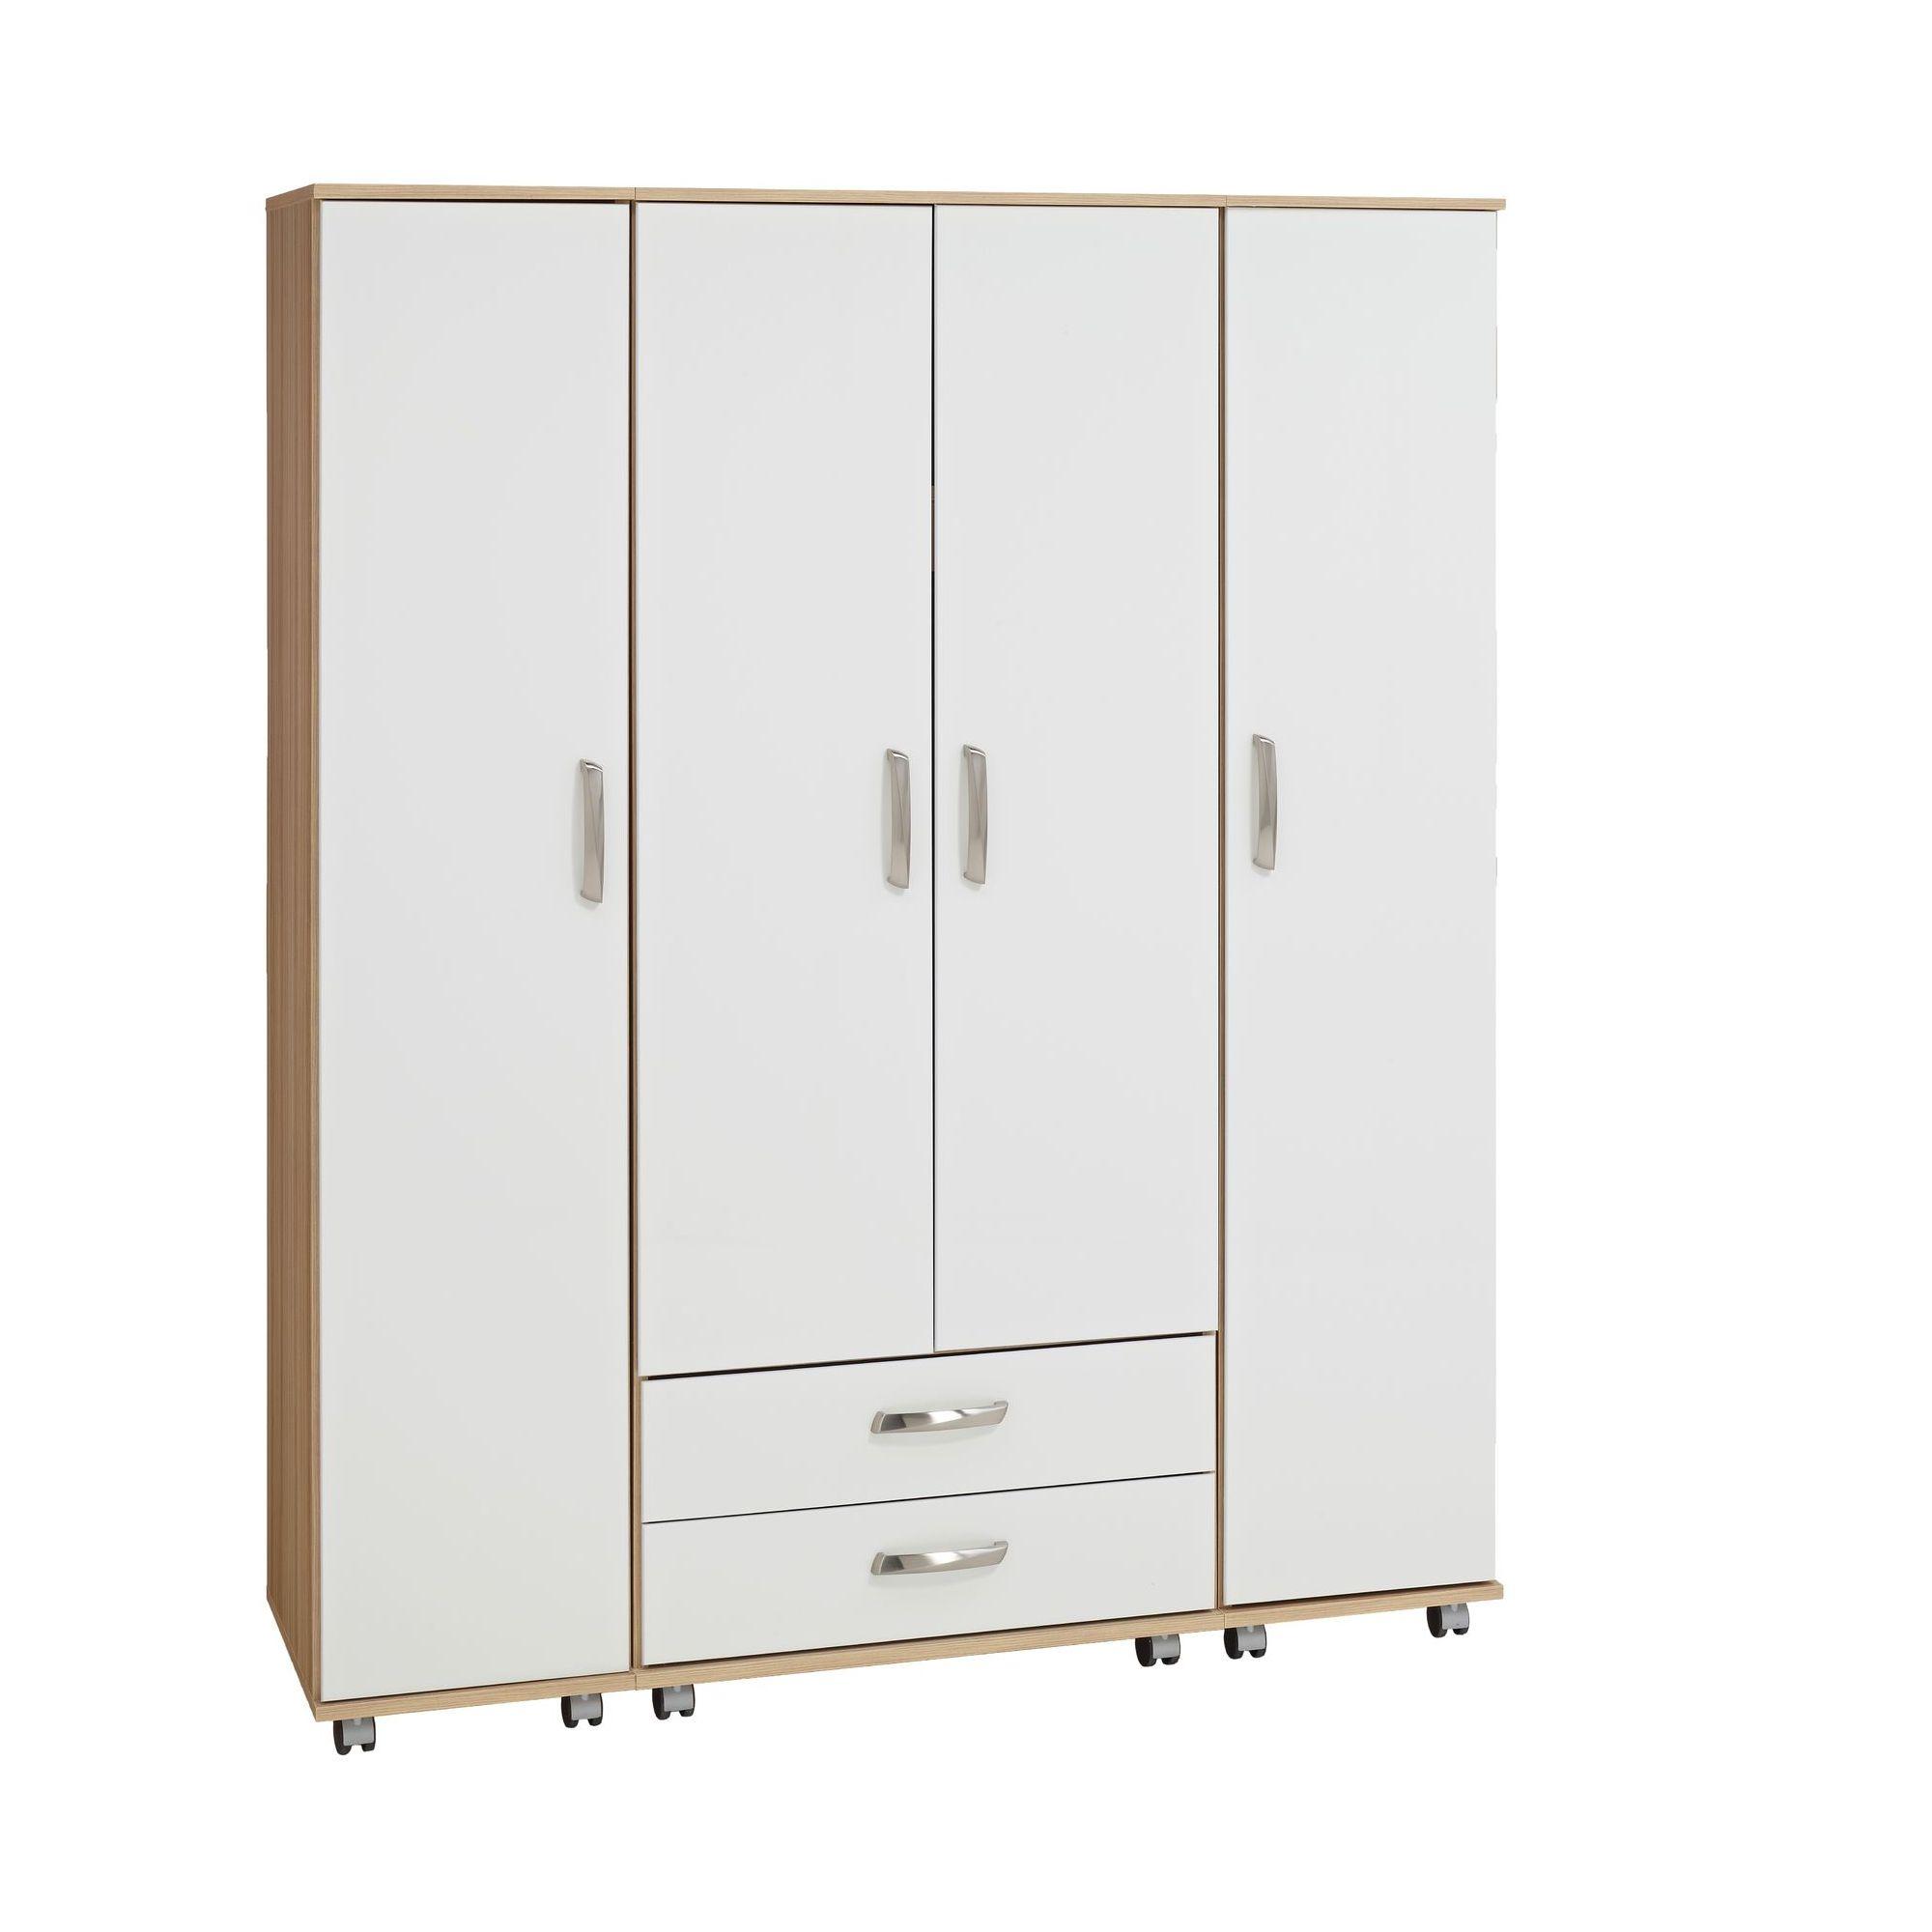 Ideal Furniture Regal 4 Door Wardrobe in white at Tesco Direct